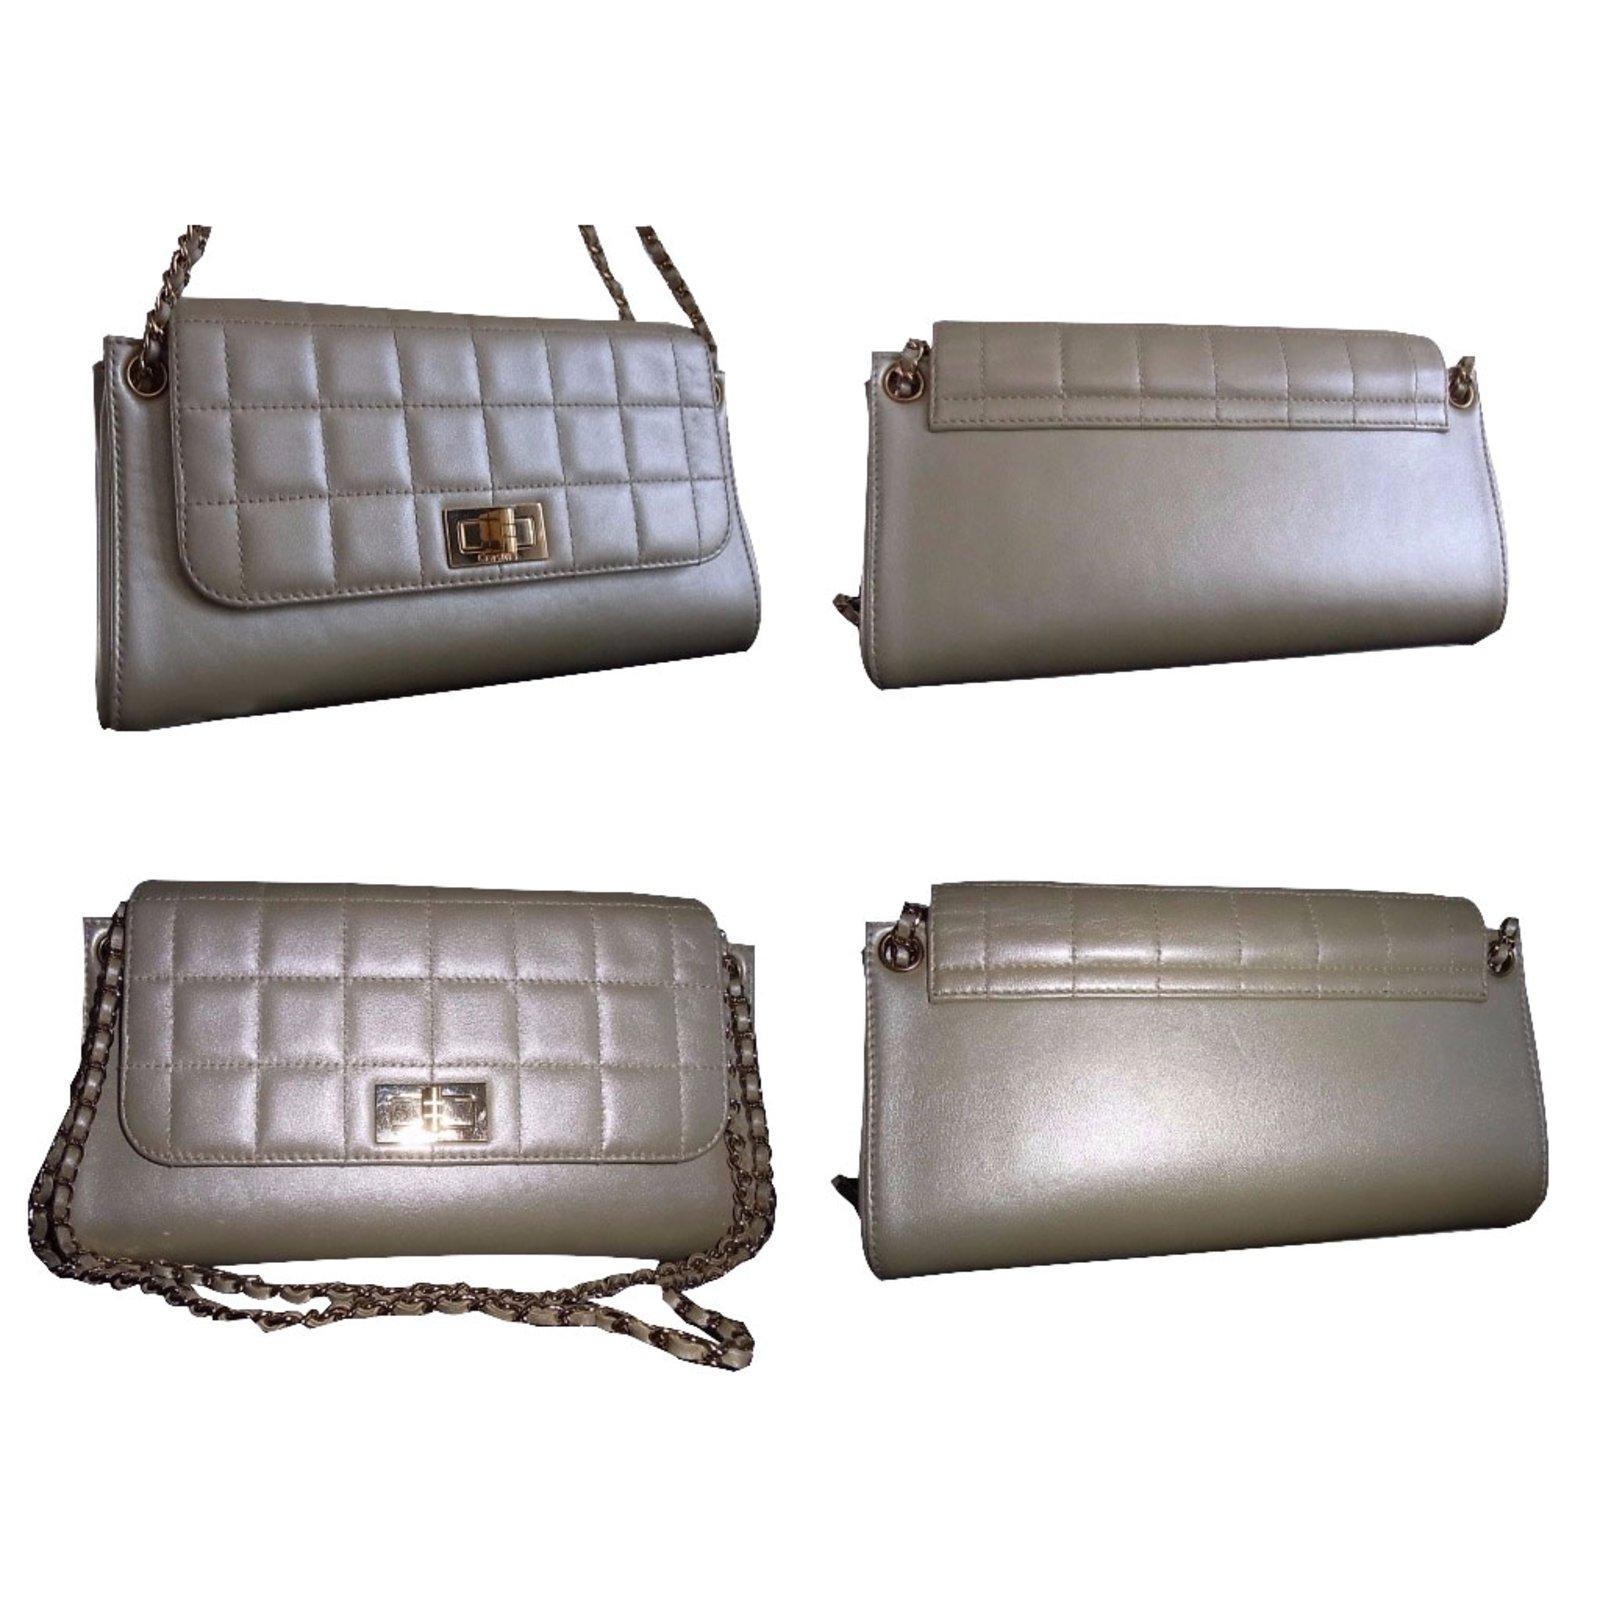 db9e60b6000a Chanel classique accordion chocolate bar Handbags Leather Golden ref.42745  - Joli Closet